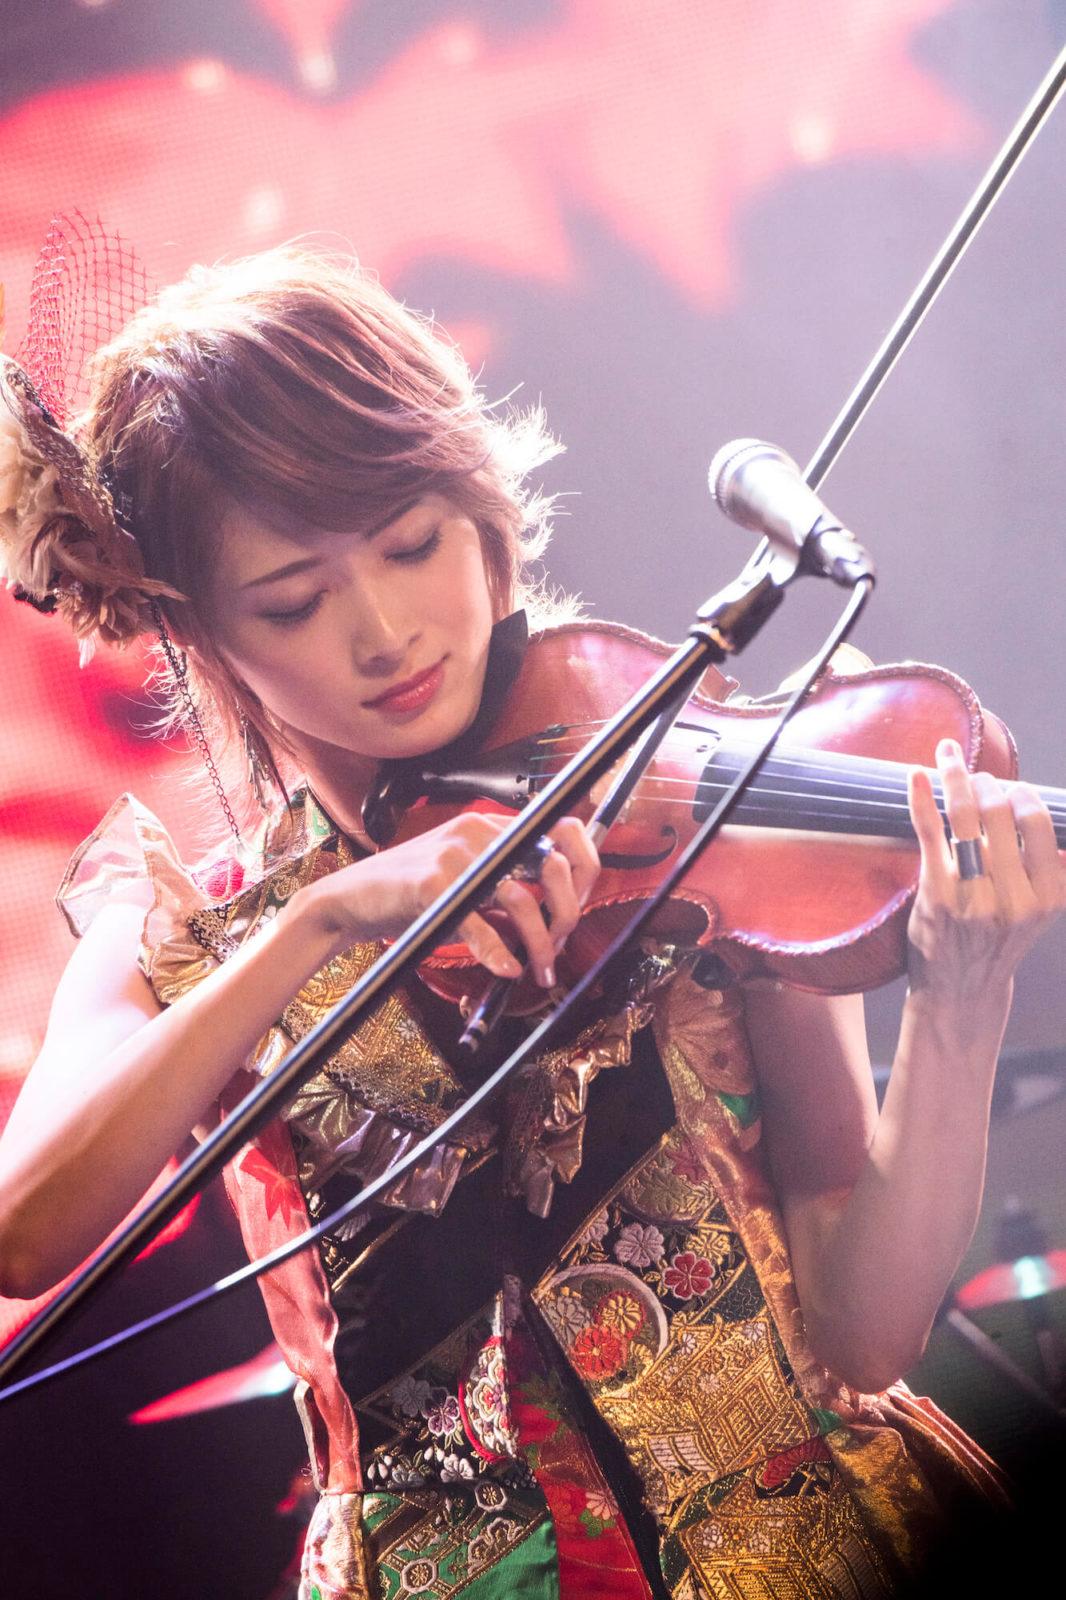 TikTokで爆発的人気!『#堕天使』の曲はロックヴァイオリニスト・Ayasaの「告白の夜」サムネイル画像